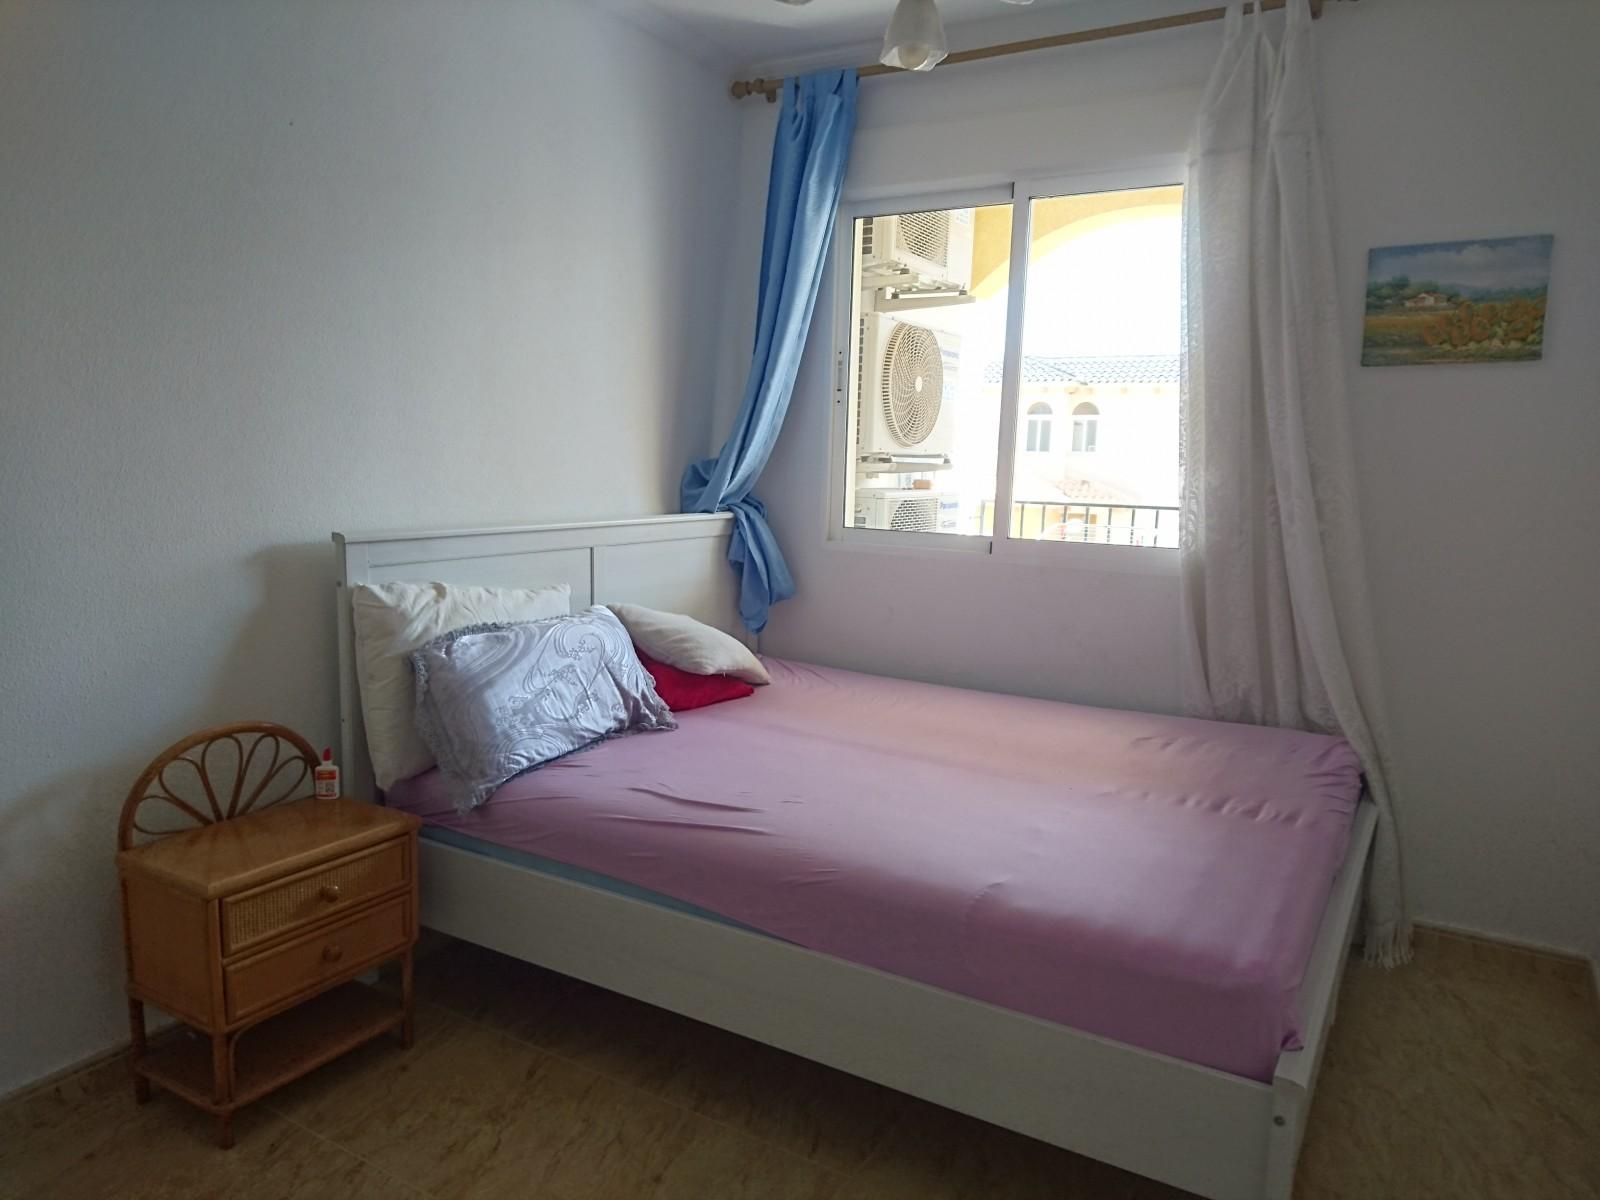 Обзор квартиры в санкт-петербурге